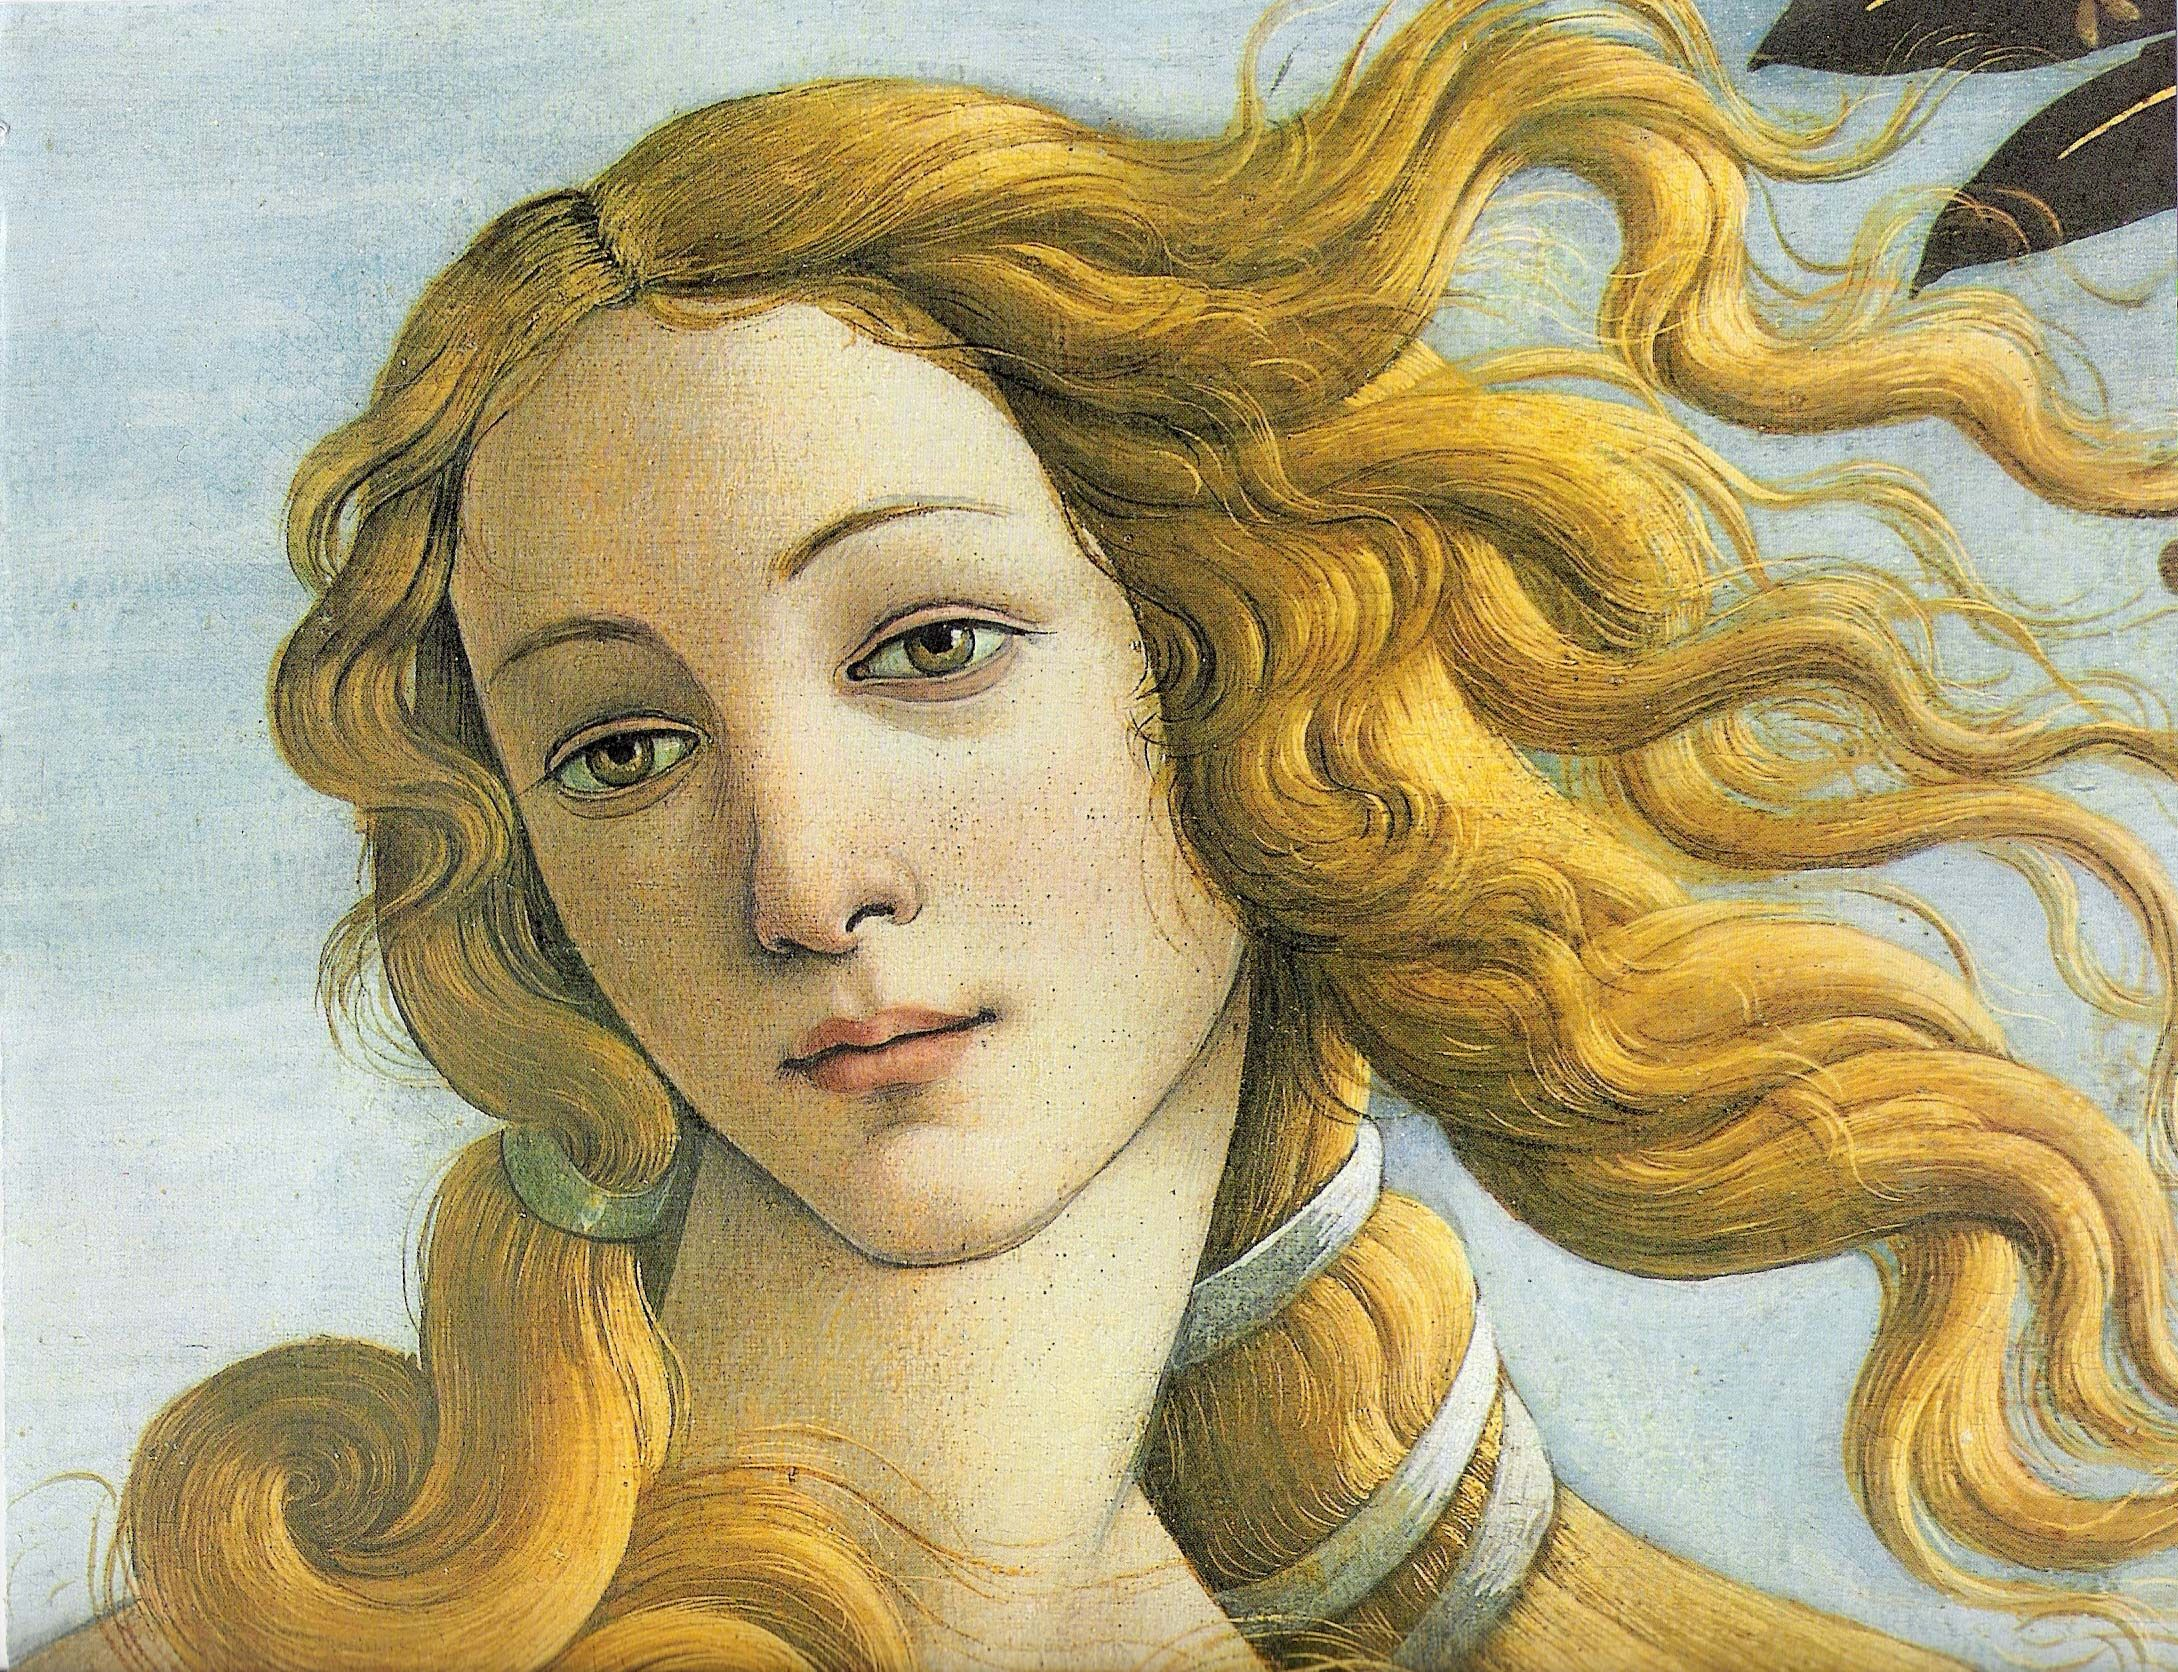 Detalhe do Nascimento de Vênus de Botticelli, Galleria degli Uffizi.